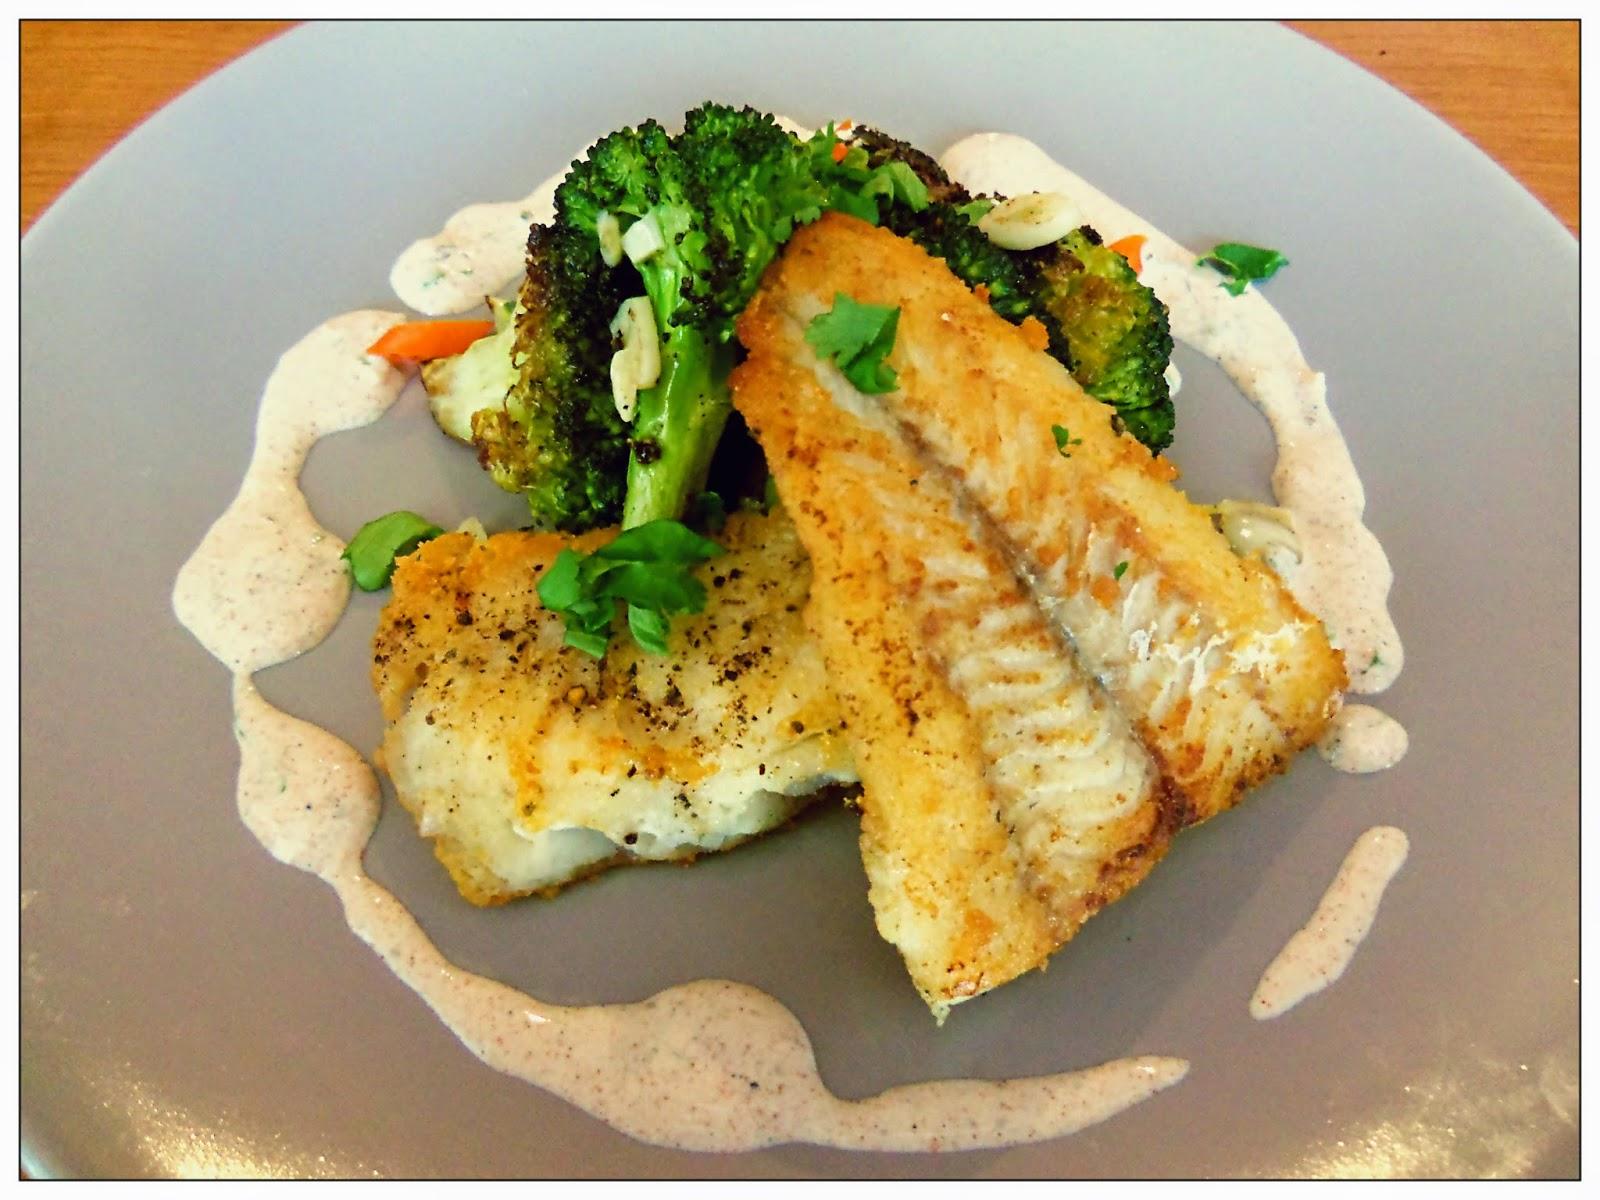 Fried fish with blistered broccoli and yogurt sauce you for Yogurt sauce for fish